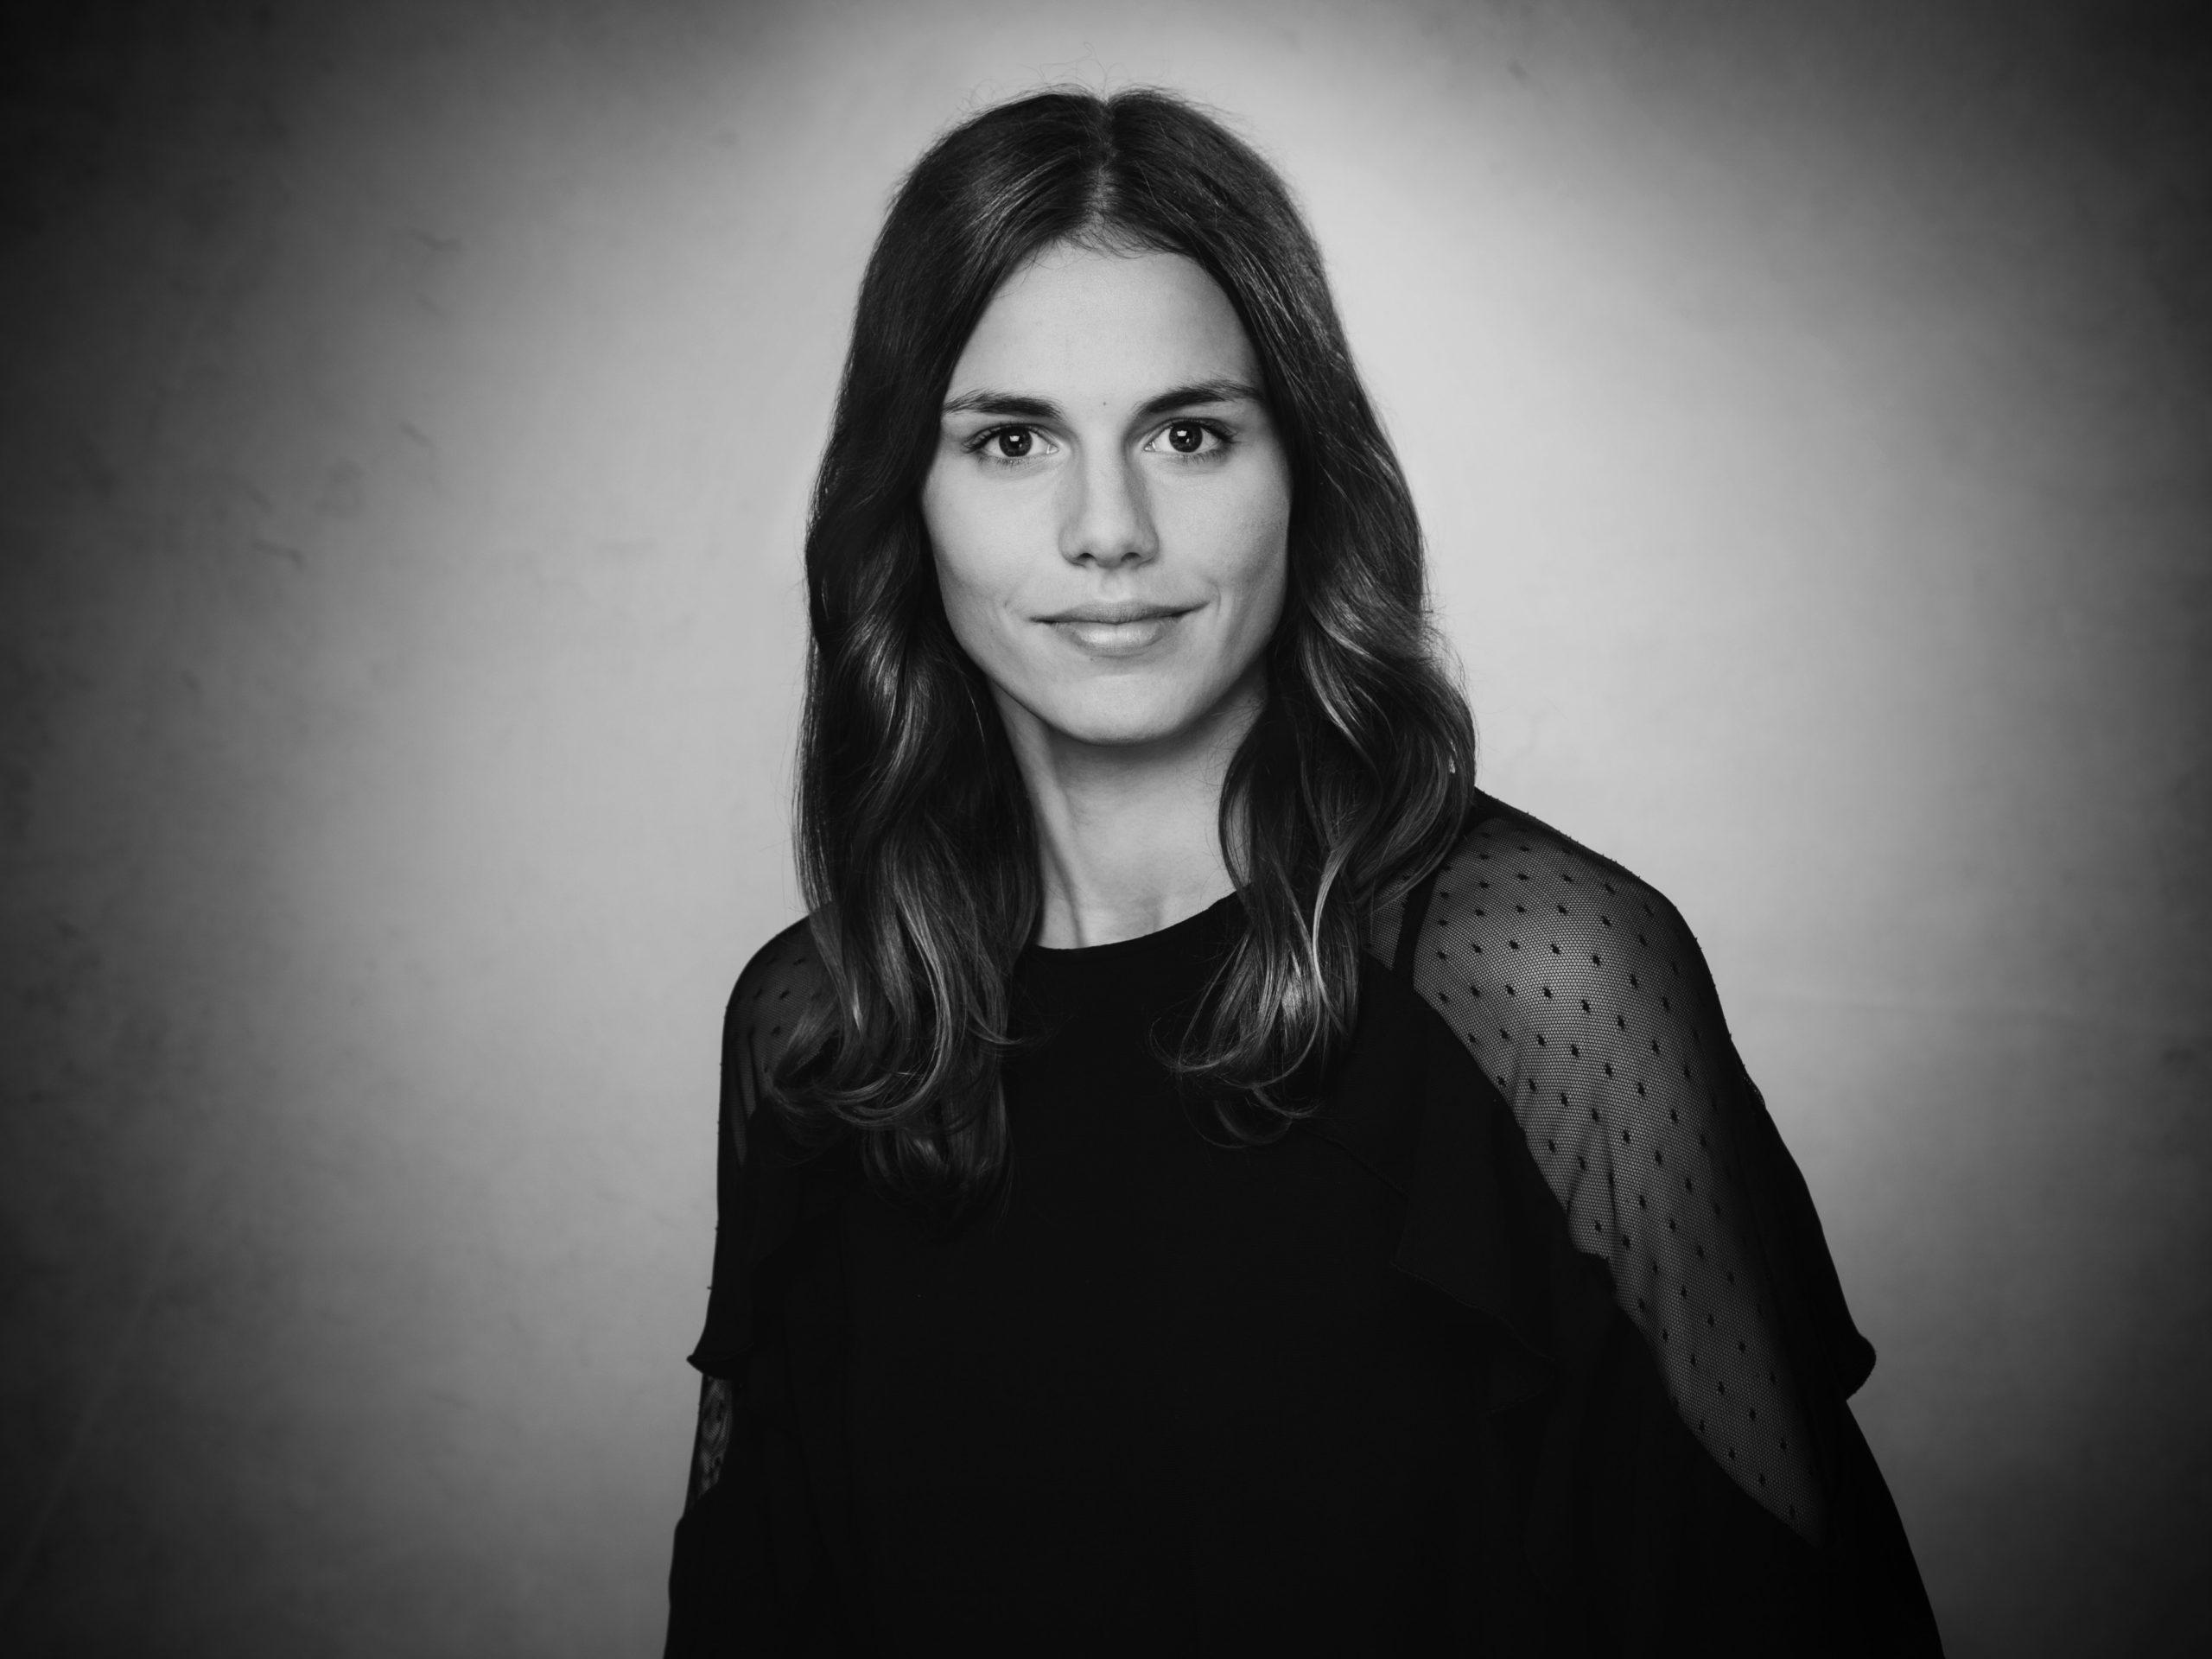 Marie Michalski